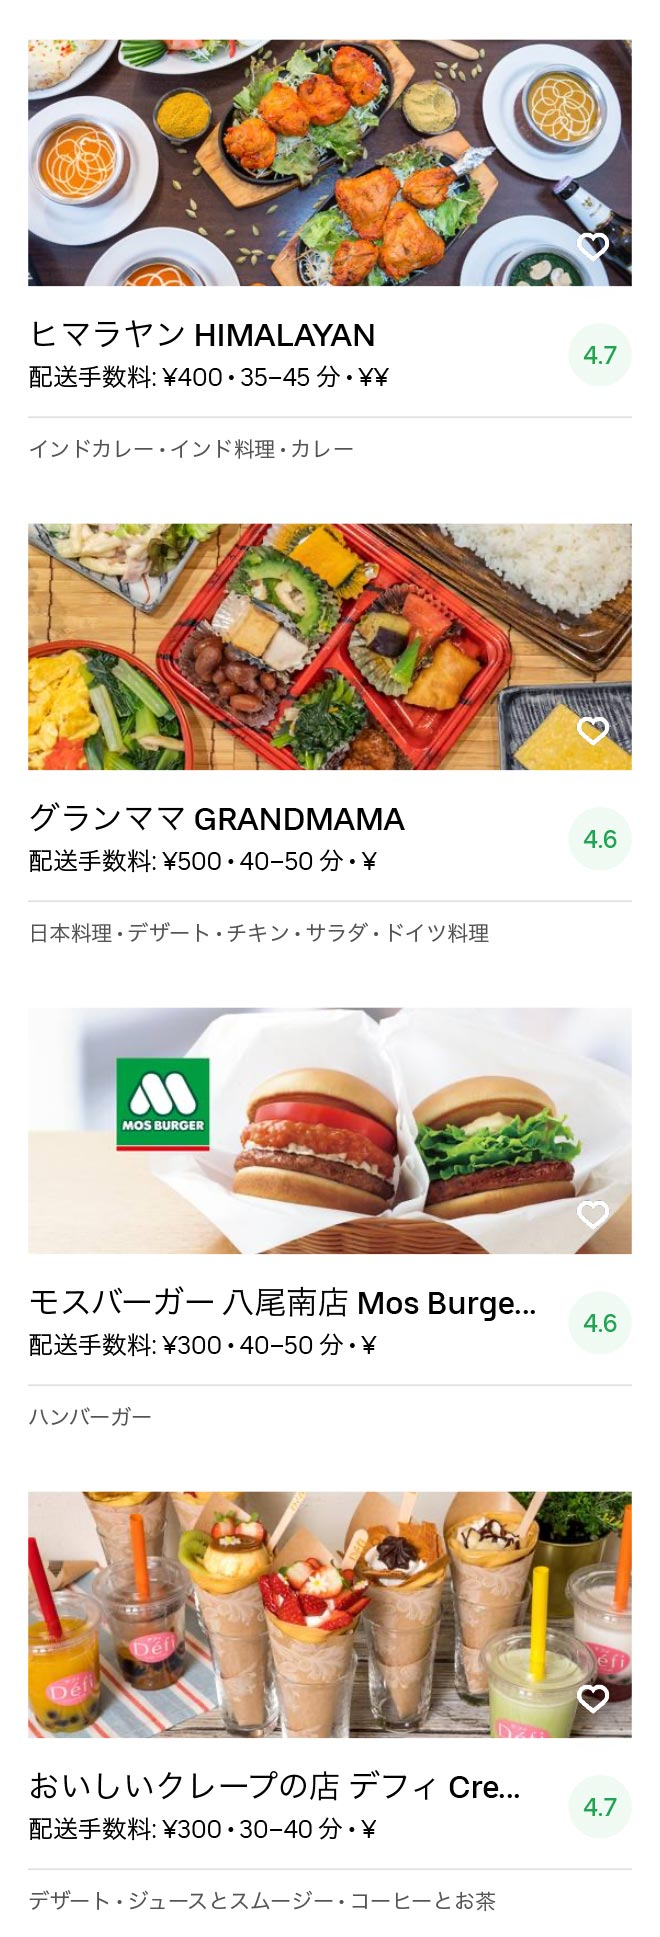 Kawachimatsubara menu 2005 09